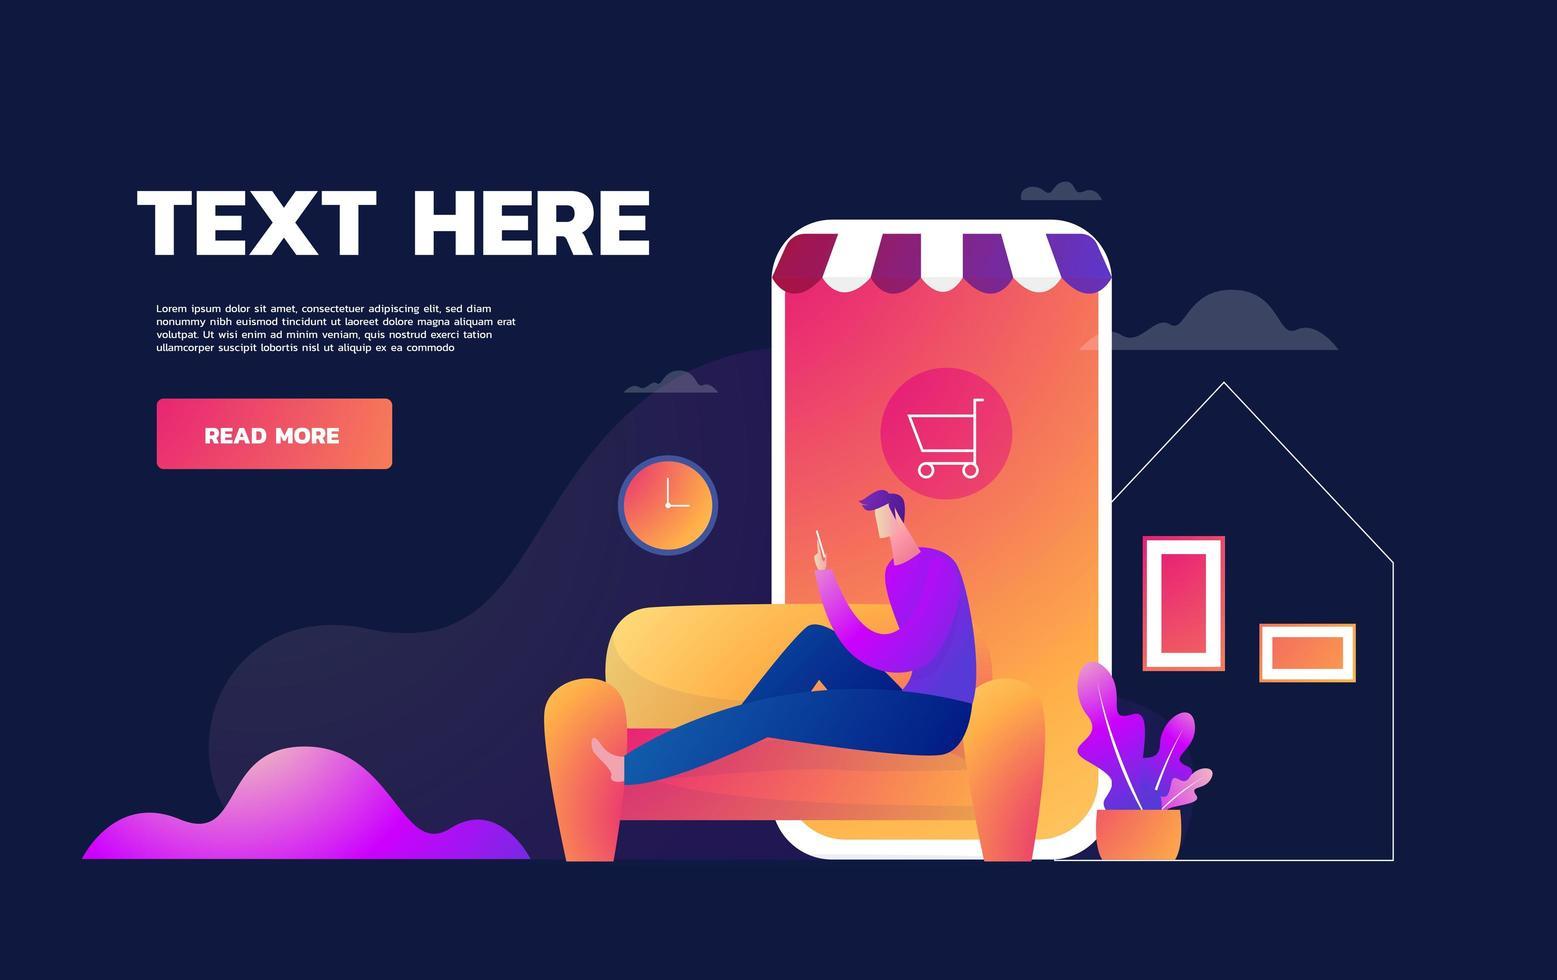 Coronavirus Epidemic Quarantine. Young Man Shopd Online. Consumerism on Smartphone Mobile App. Buy at Home. Survive COVID 19. Flat vector illustration